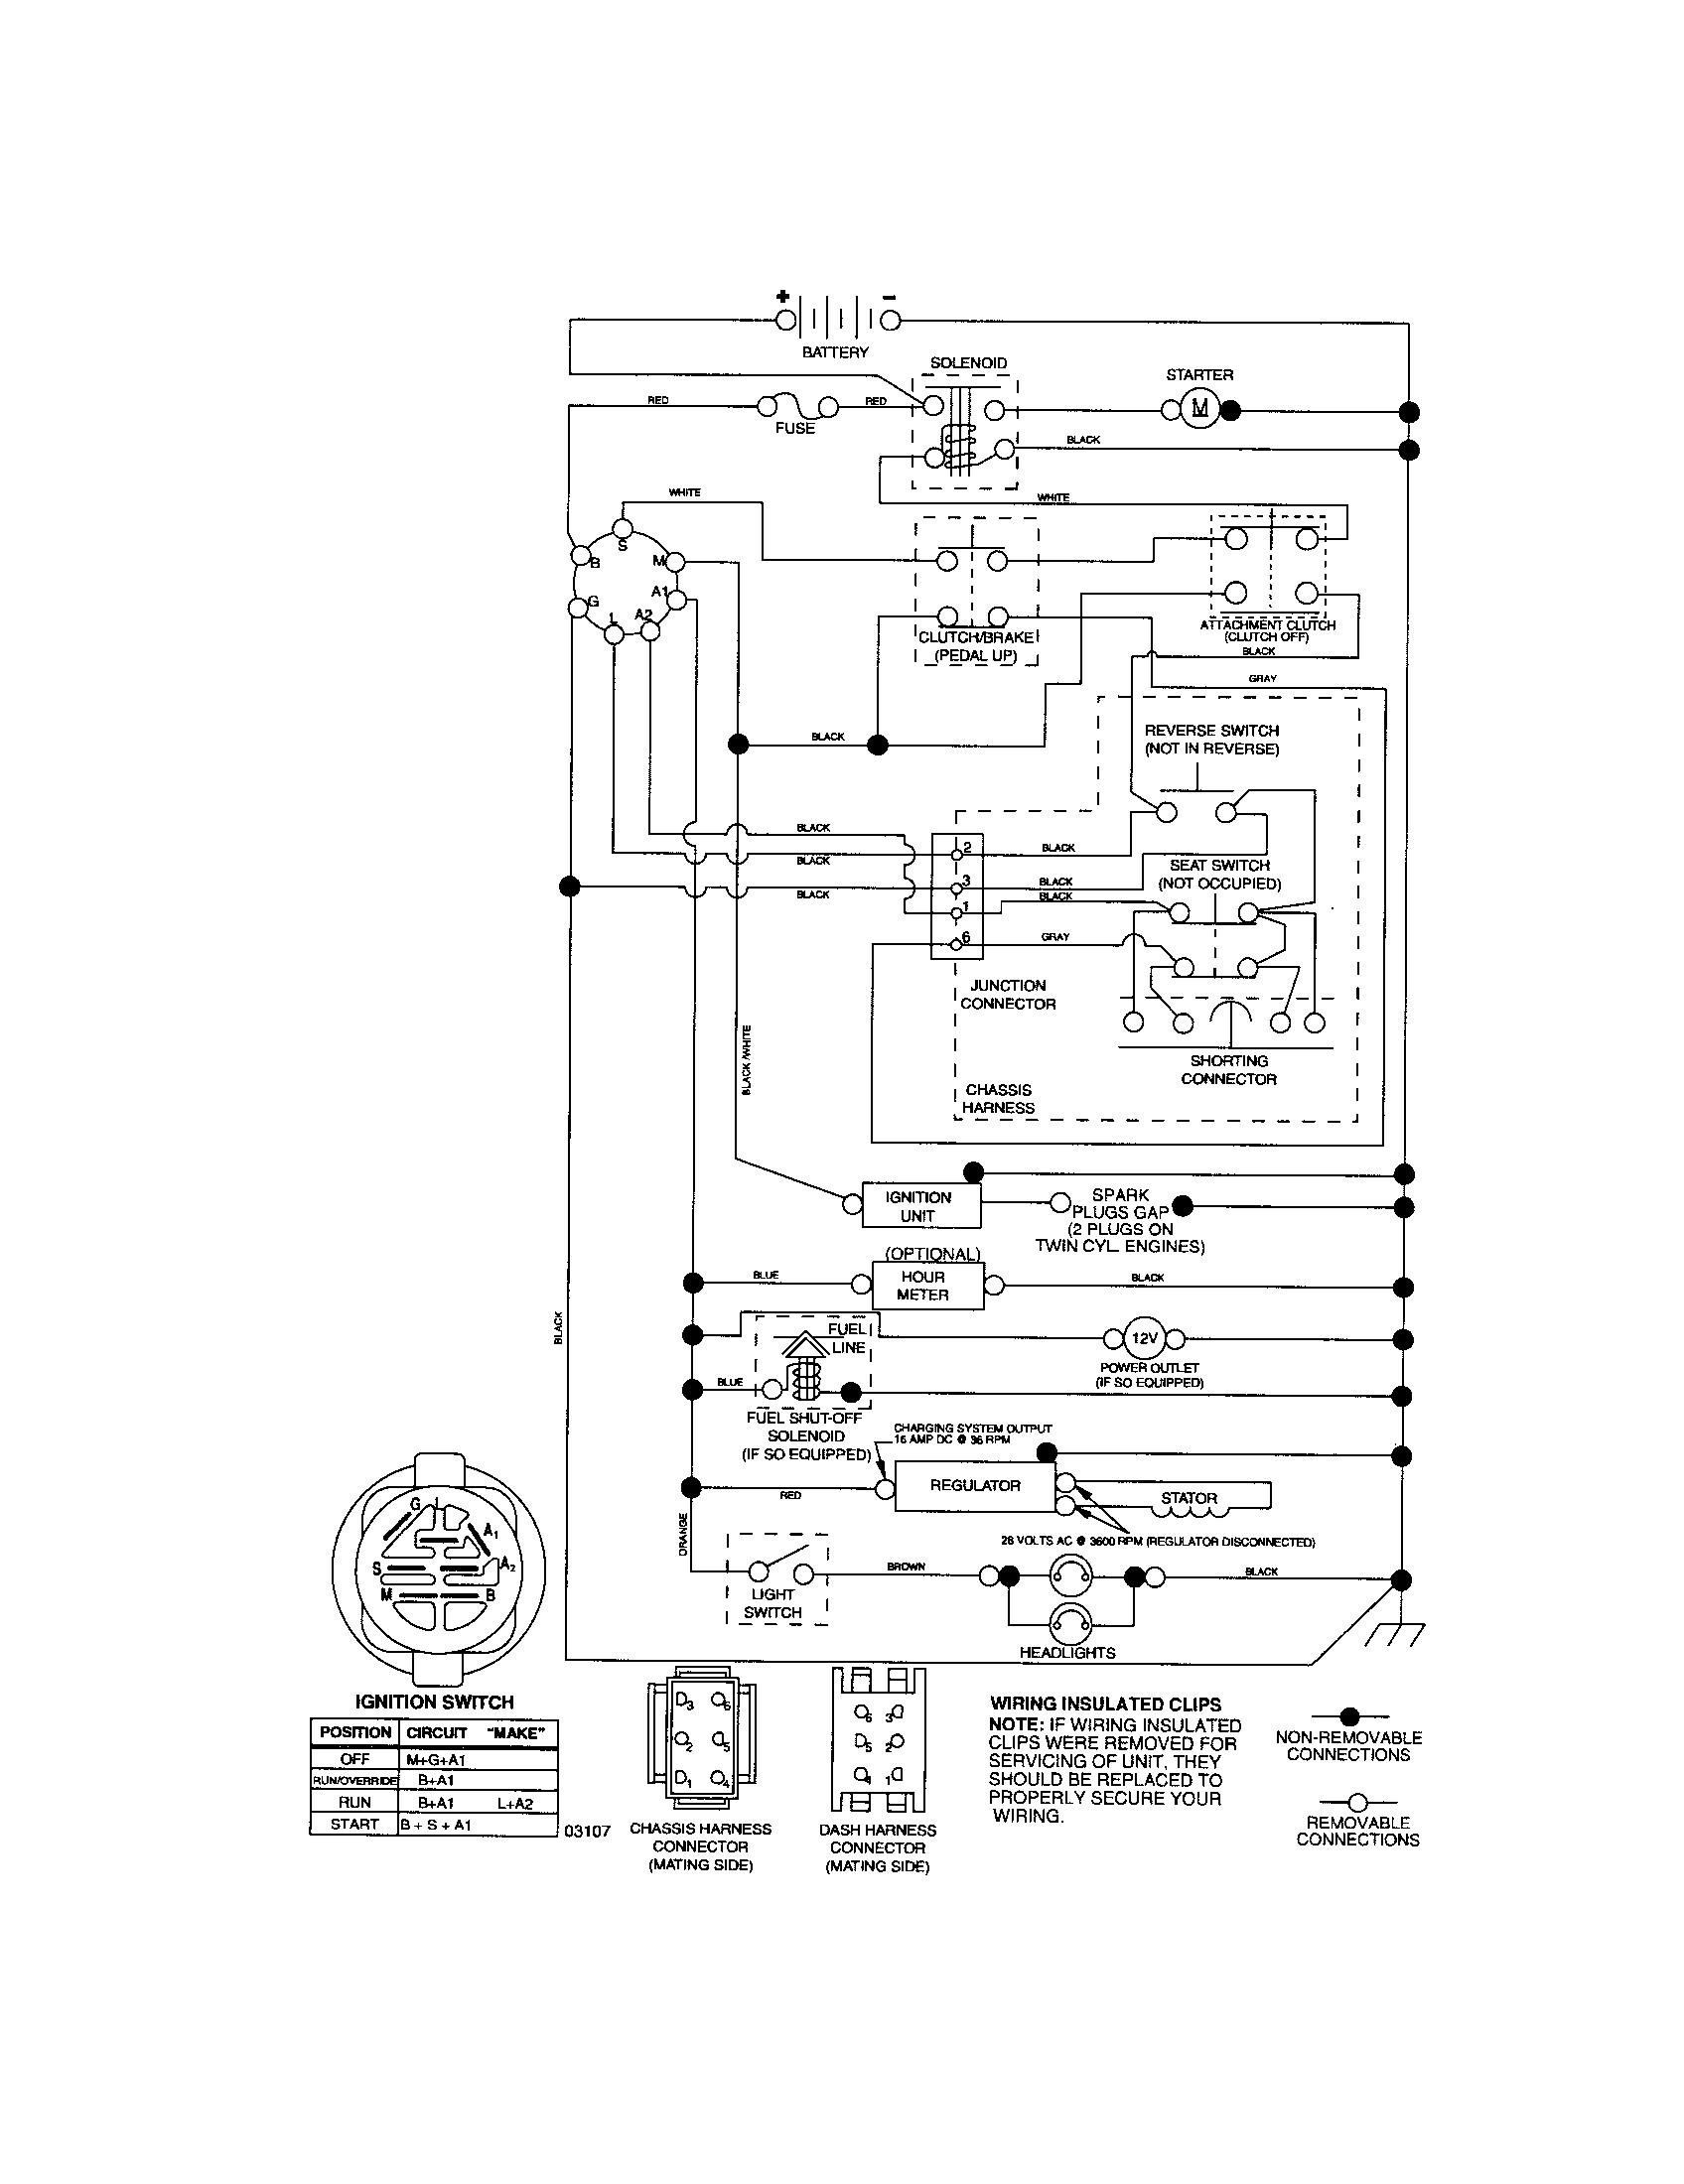 Small Engine Repair Diagrams Craftsman Riding Mower Electrical Diagram Of Small Engine Repair Diagrams